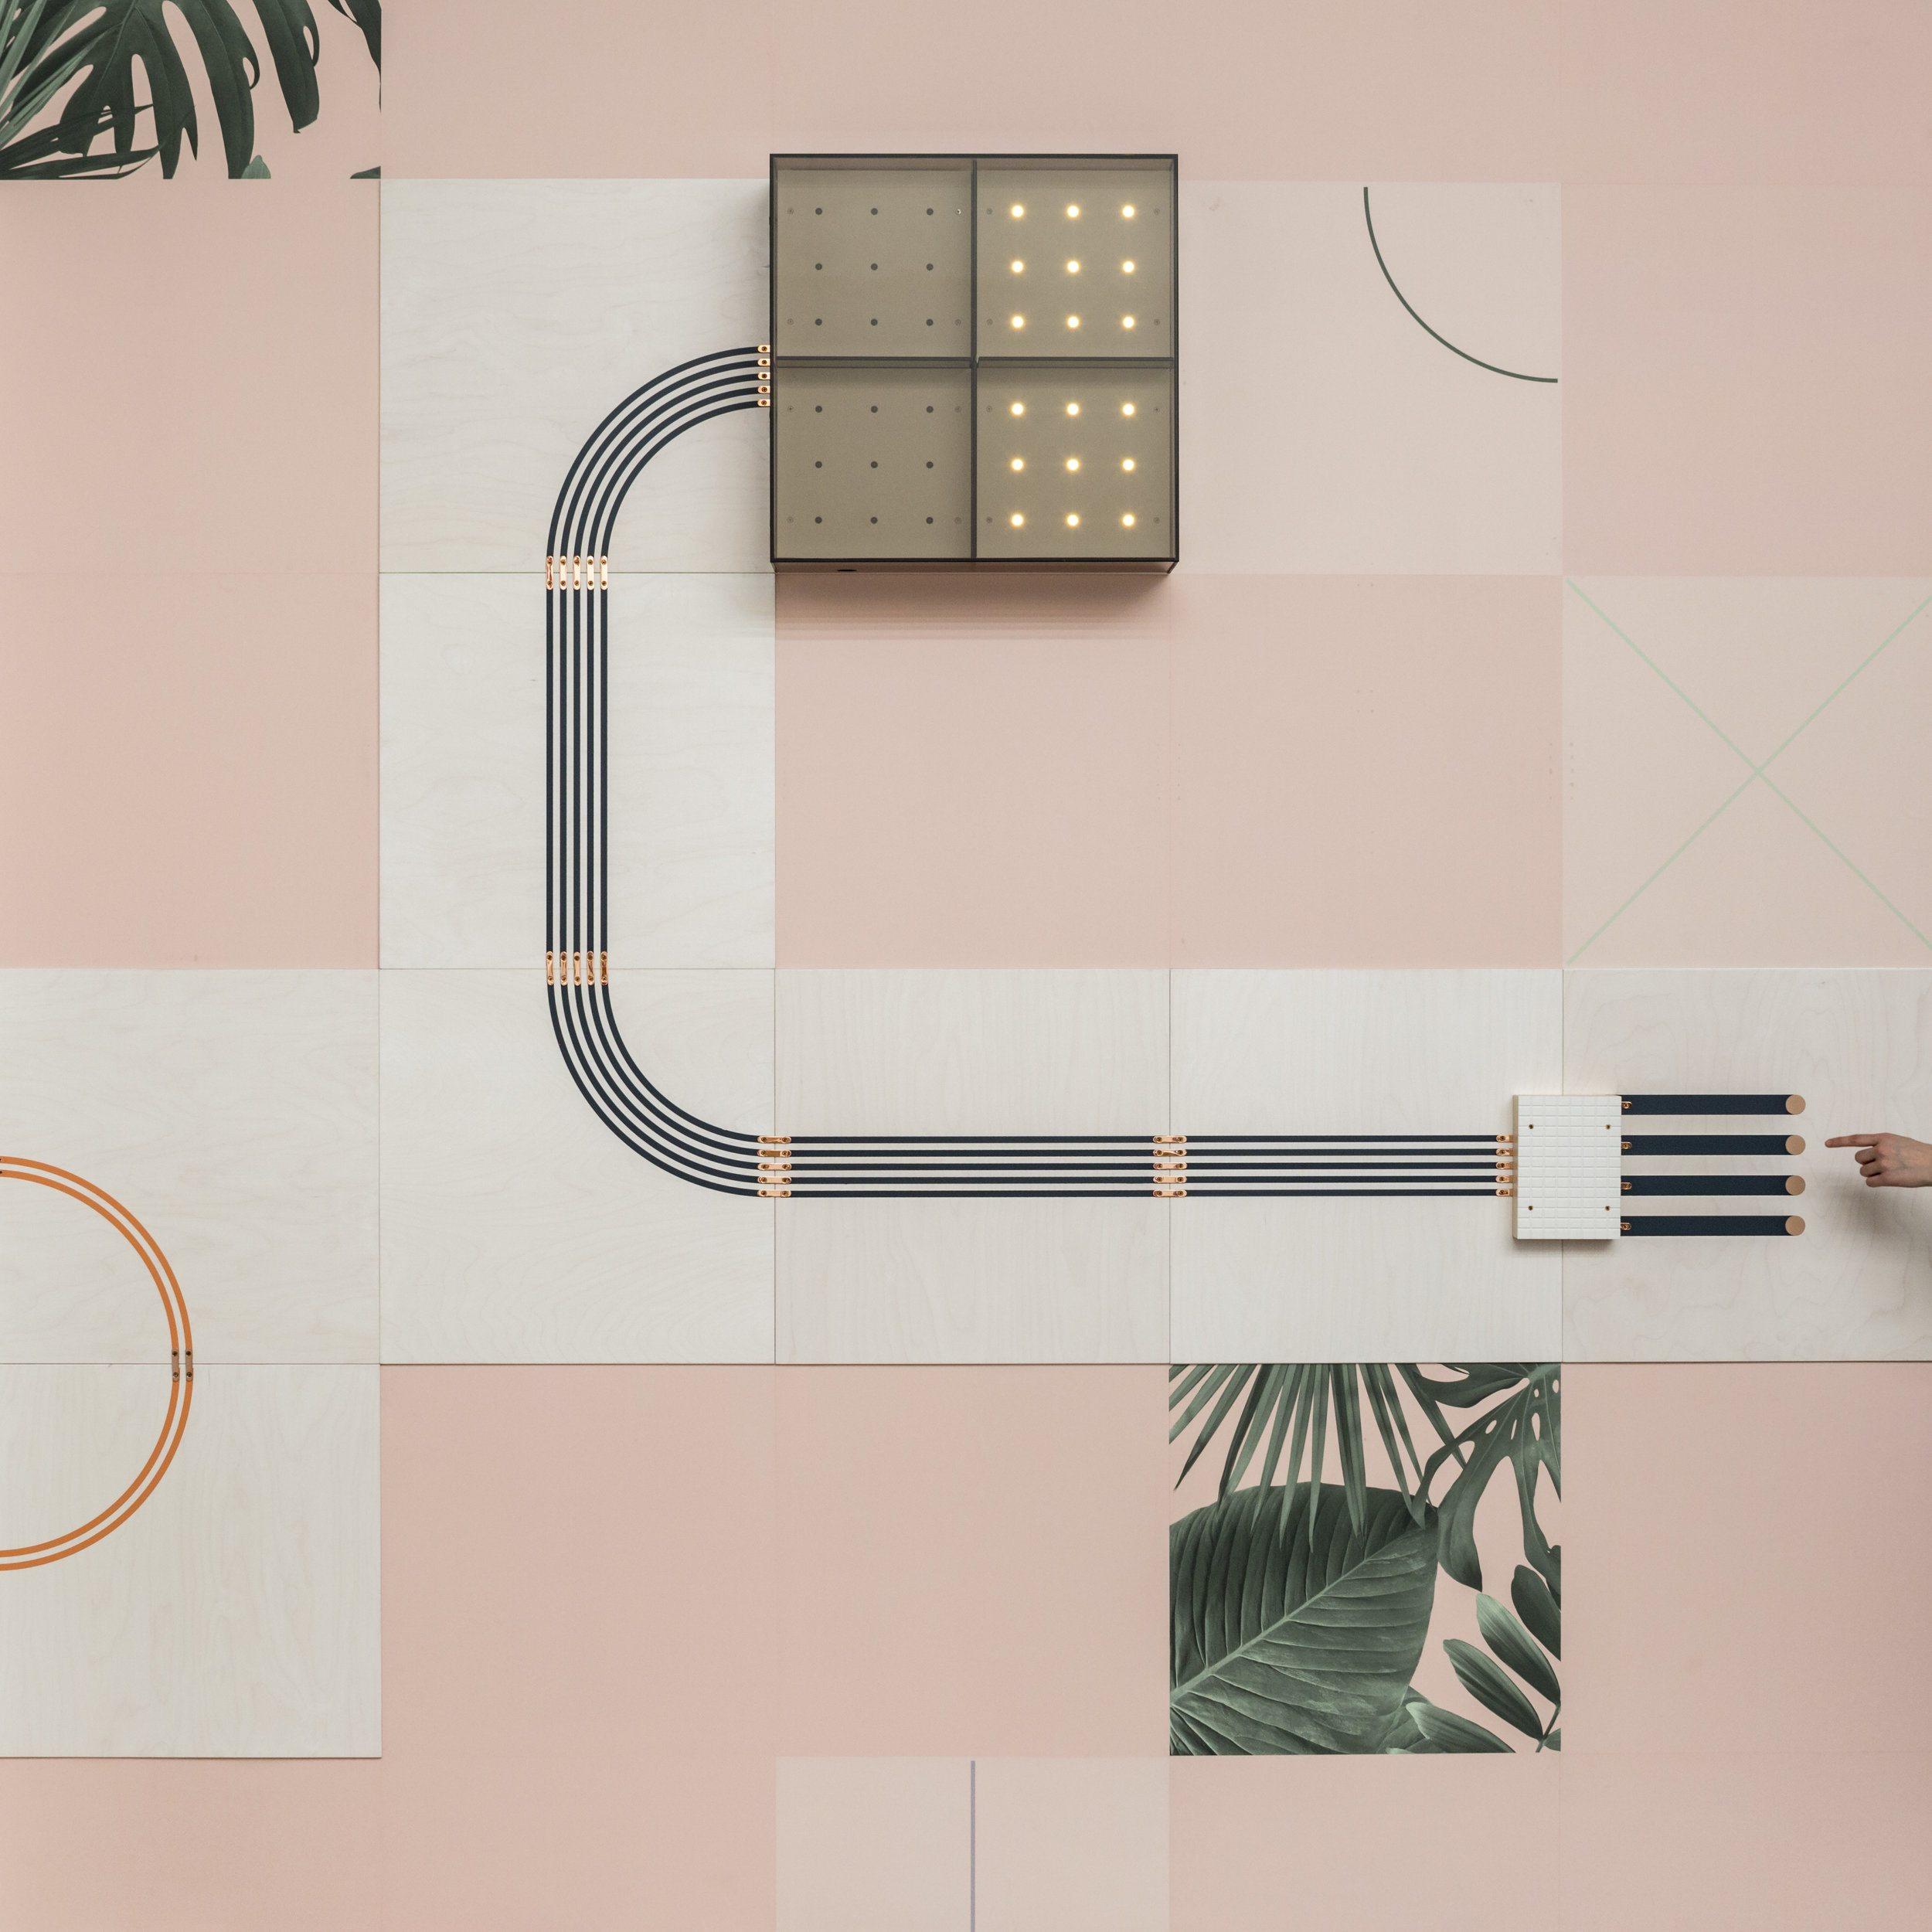 Conduct wallpaper, Flavor Paper, UM Project, power source wallpaper